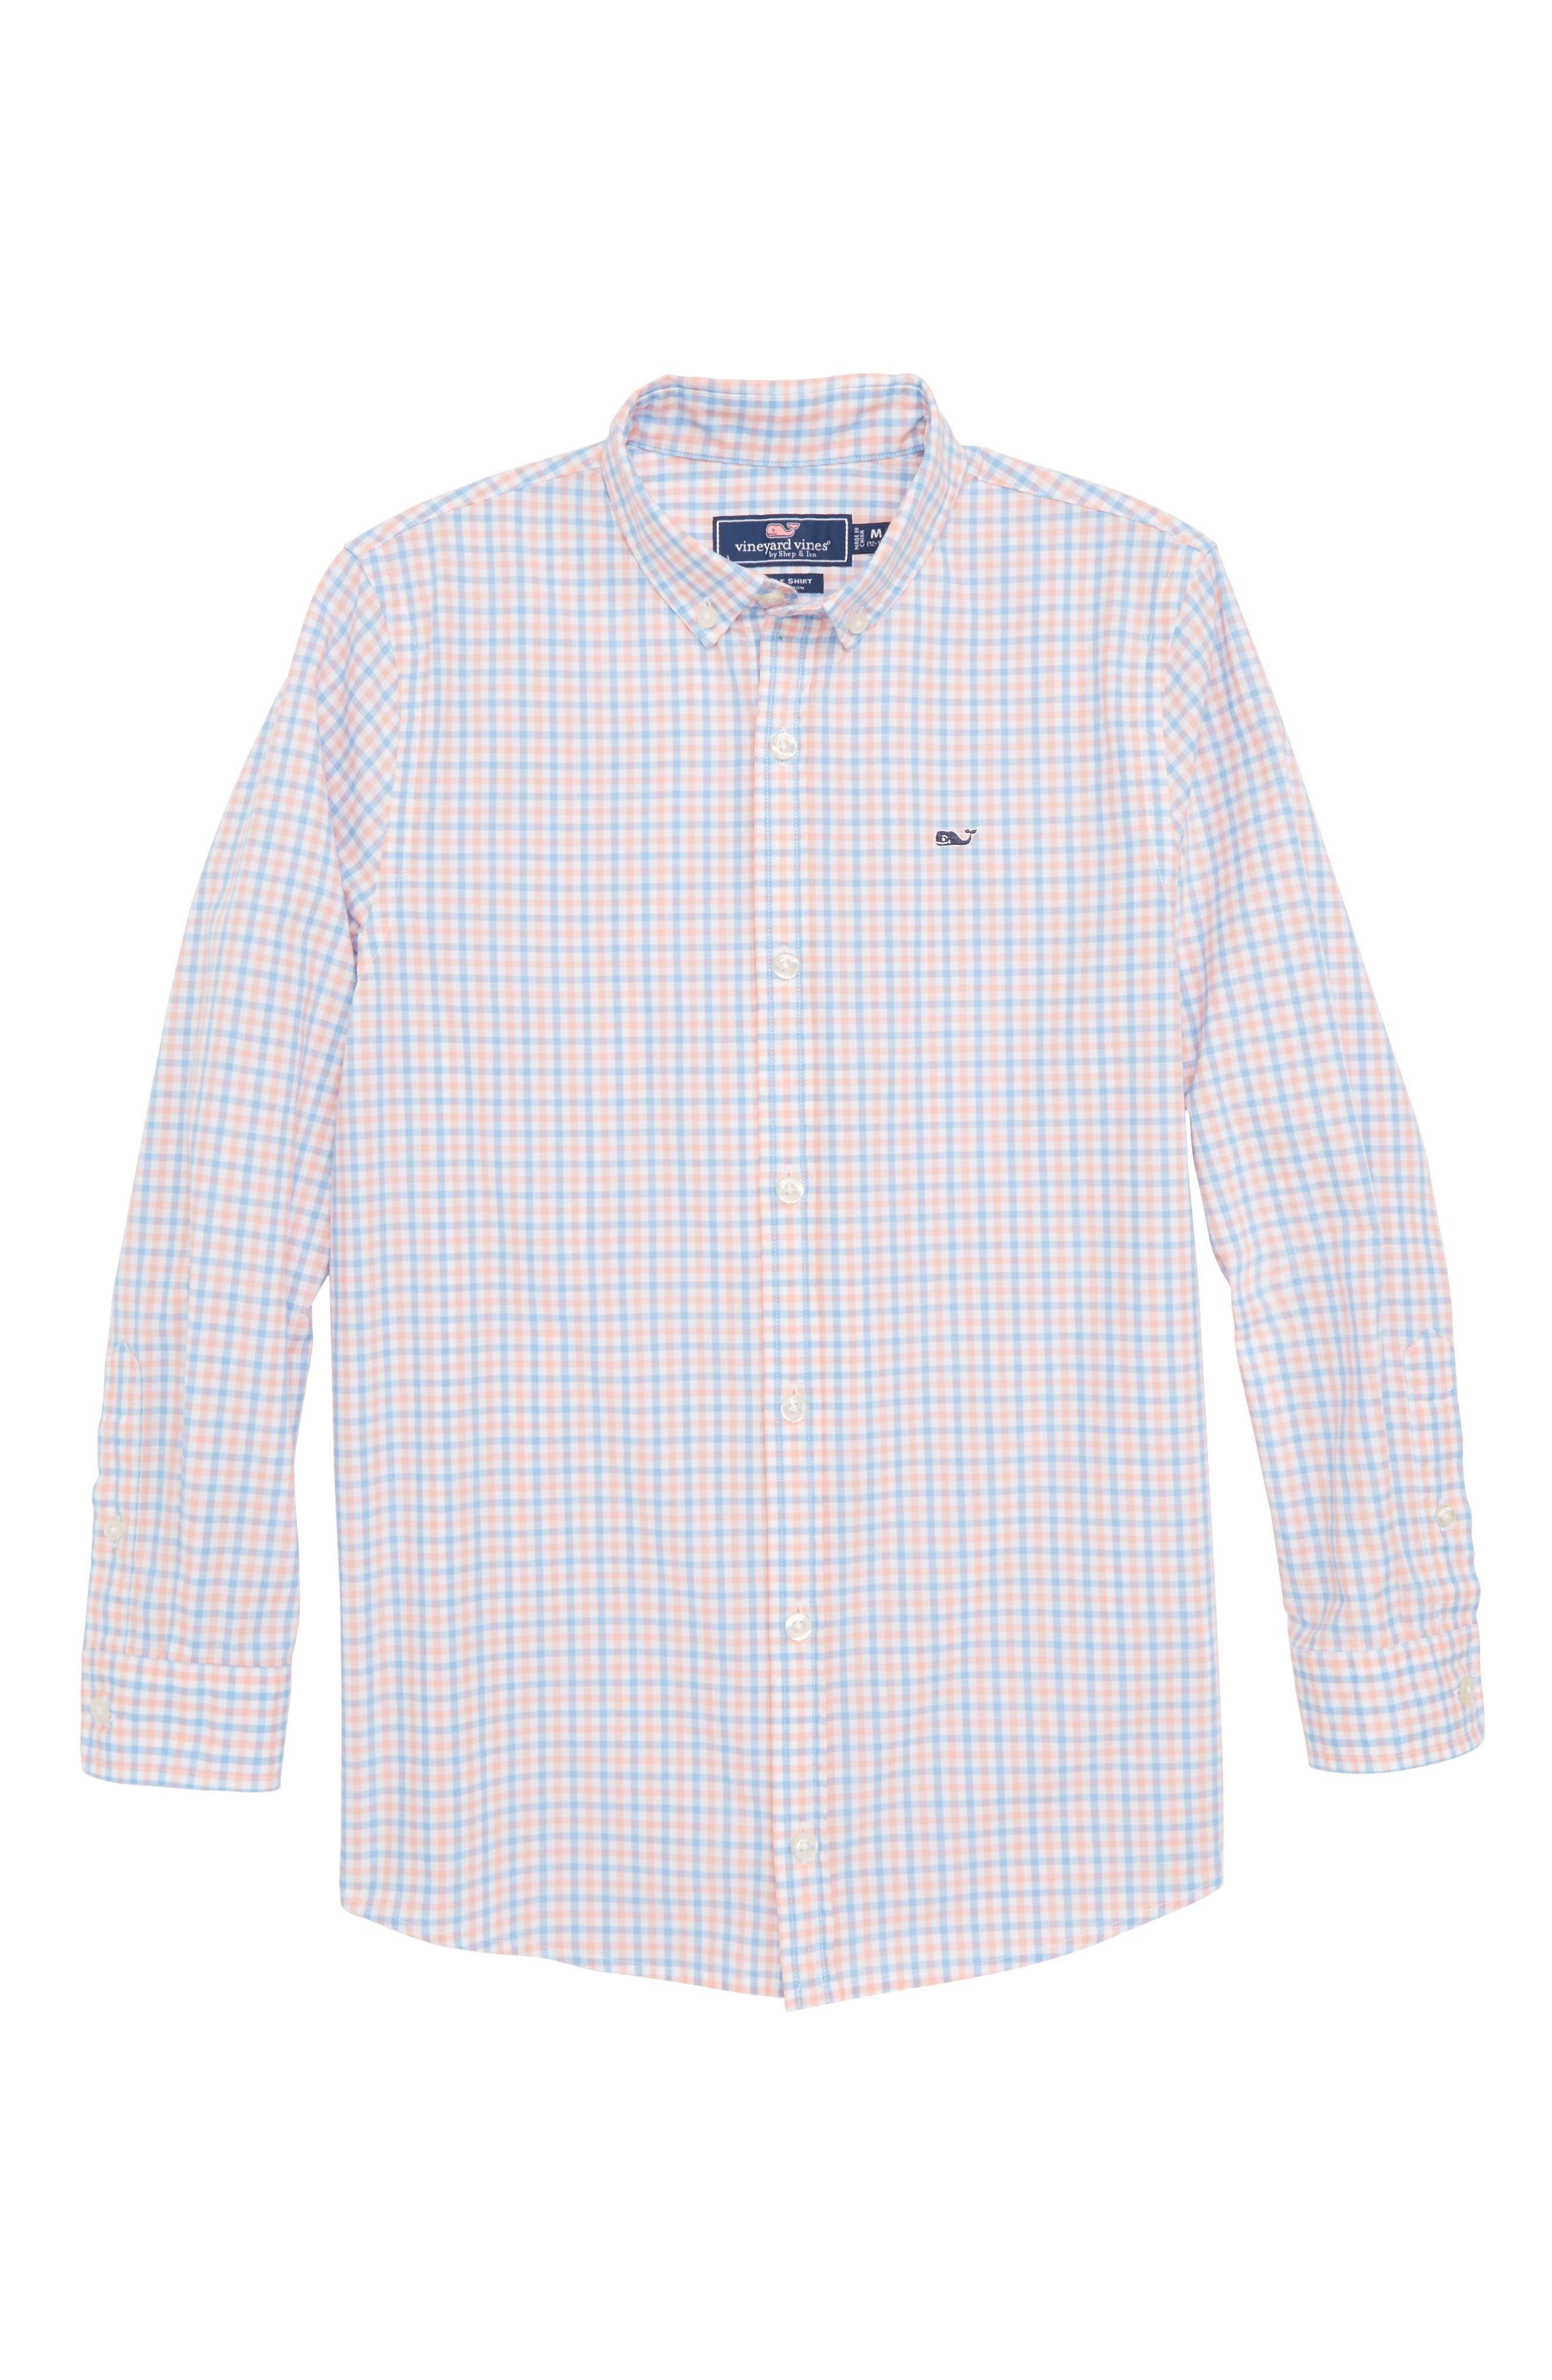 Winding Bay Gingham Woven Shirt,                             Main thumbnail 1, color,                             Bright Peach